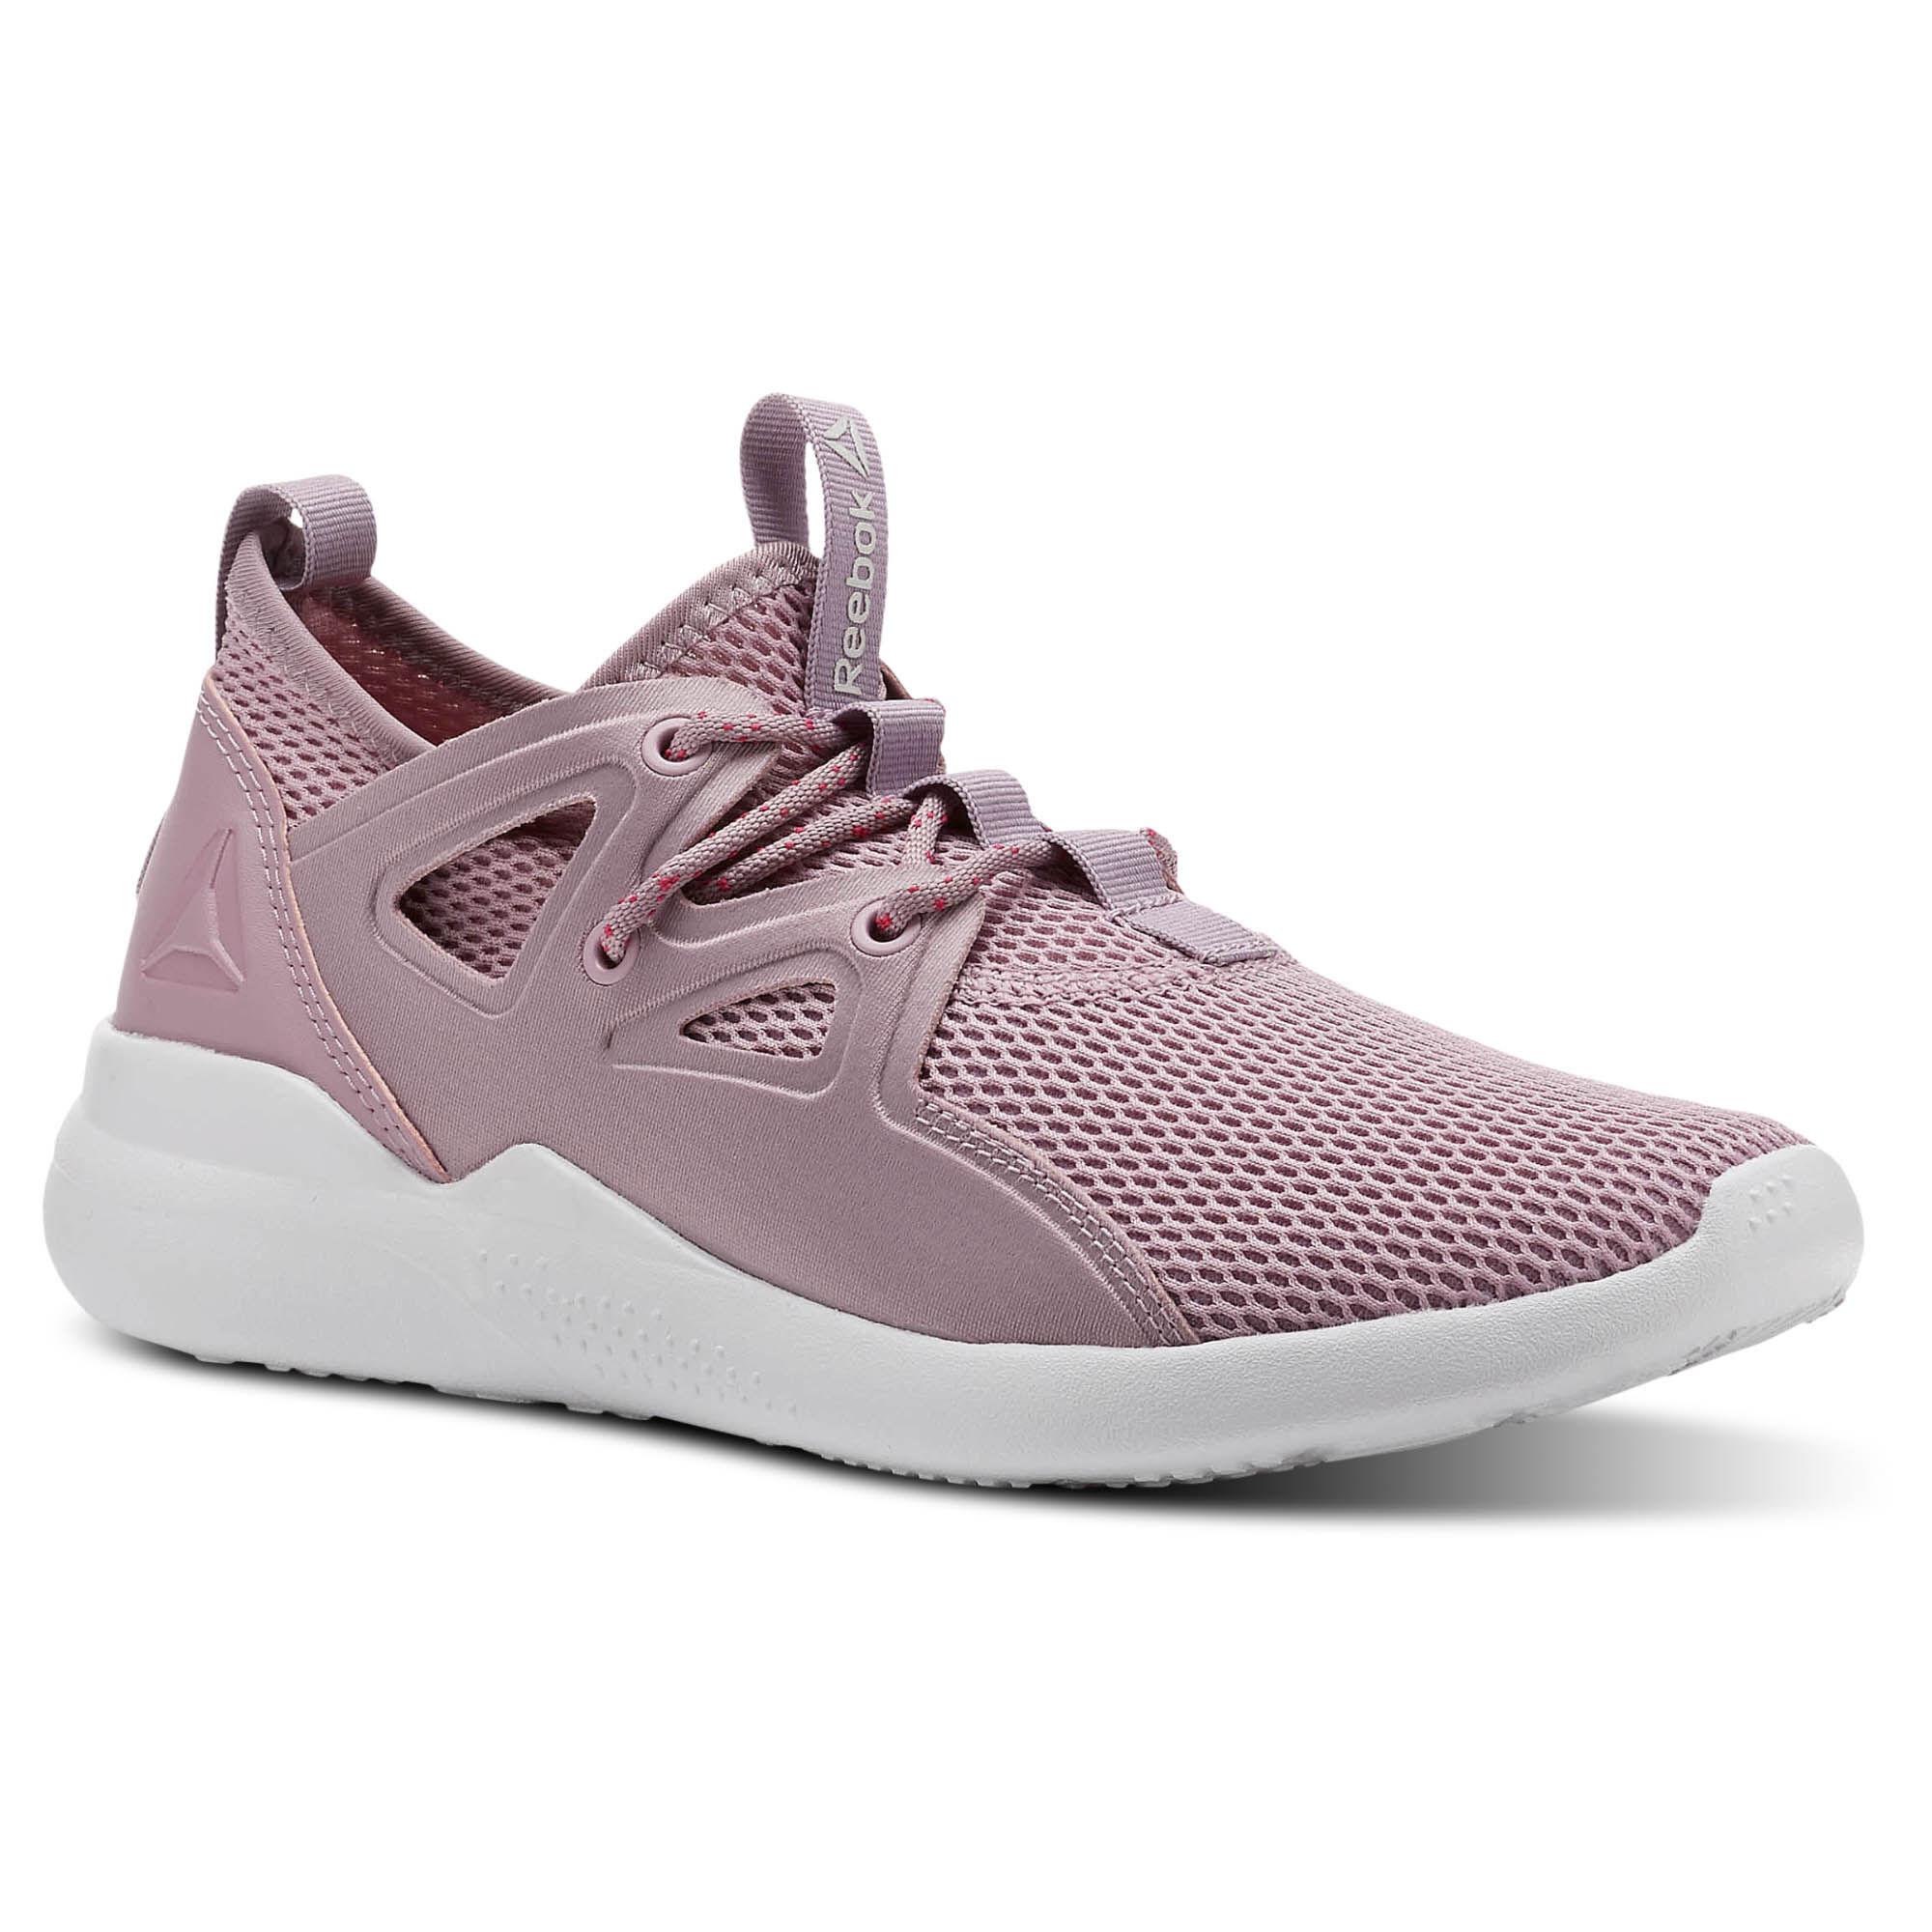 Reebok REAGO PULSE - Sports shoes - lavendar/lilac/porcelain uFey5UQ9